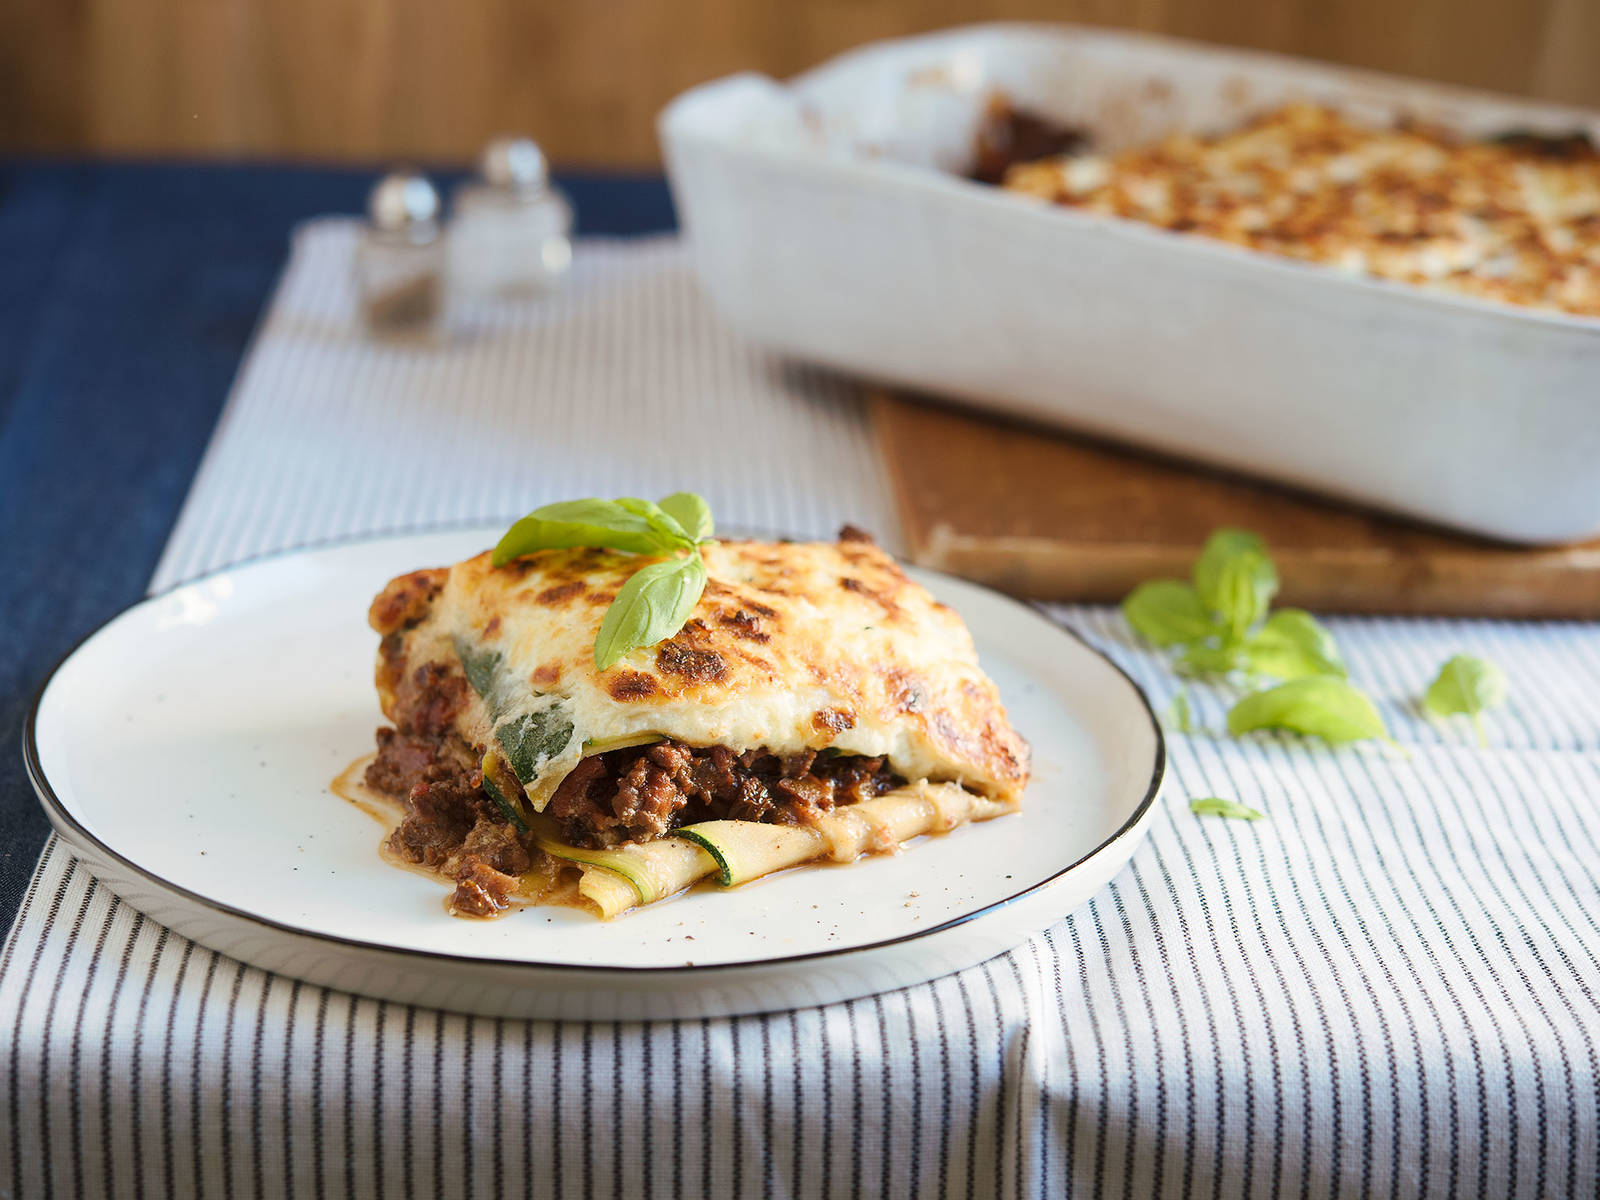 Low-carb lasagna